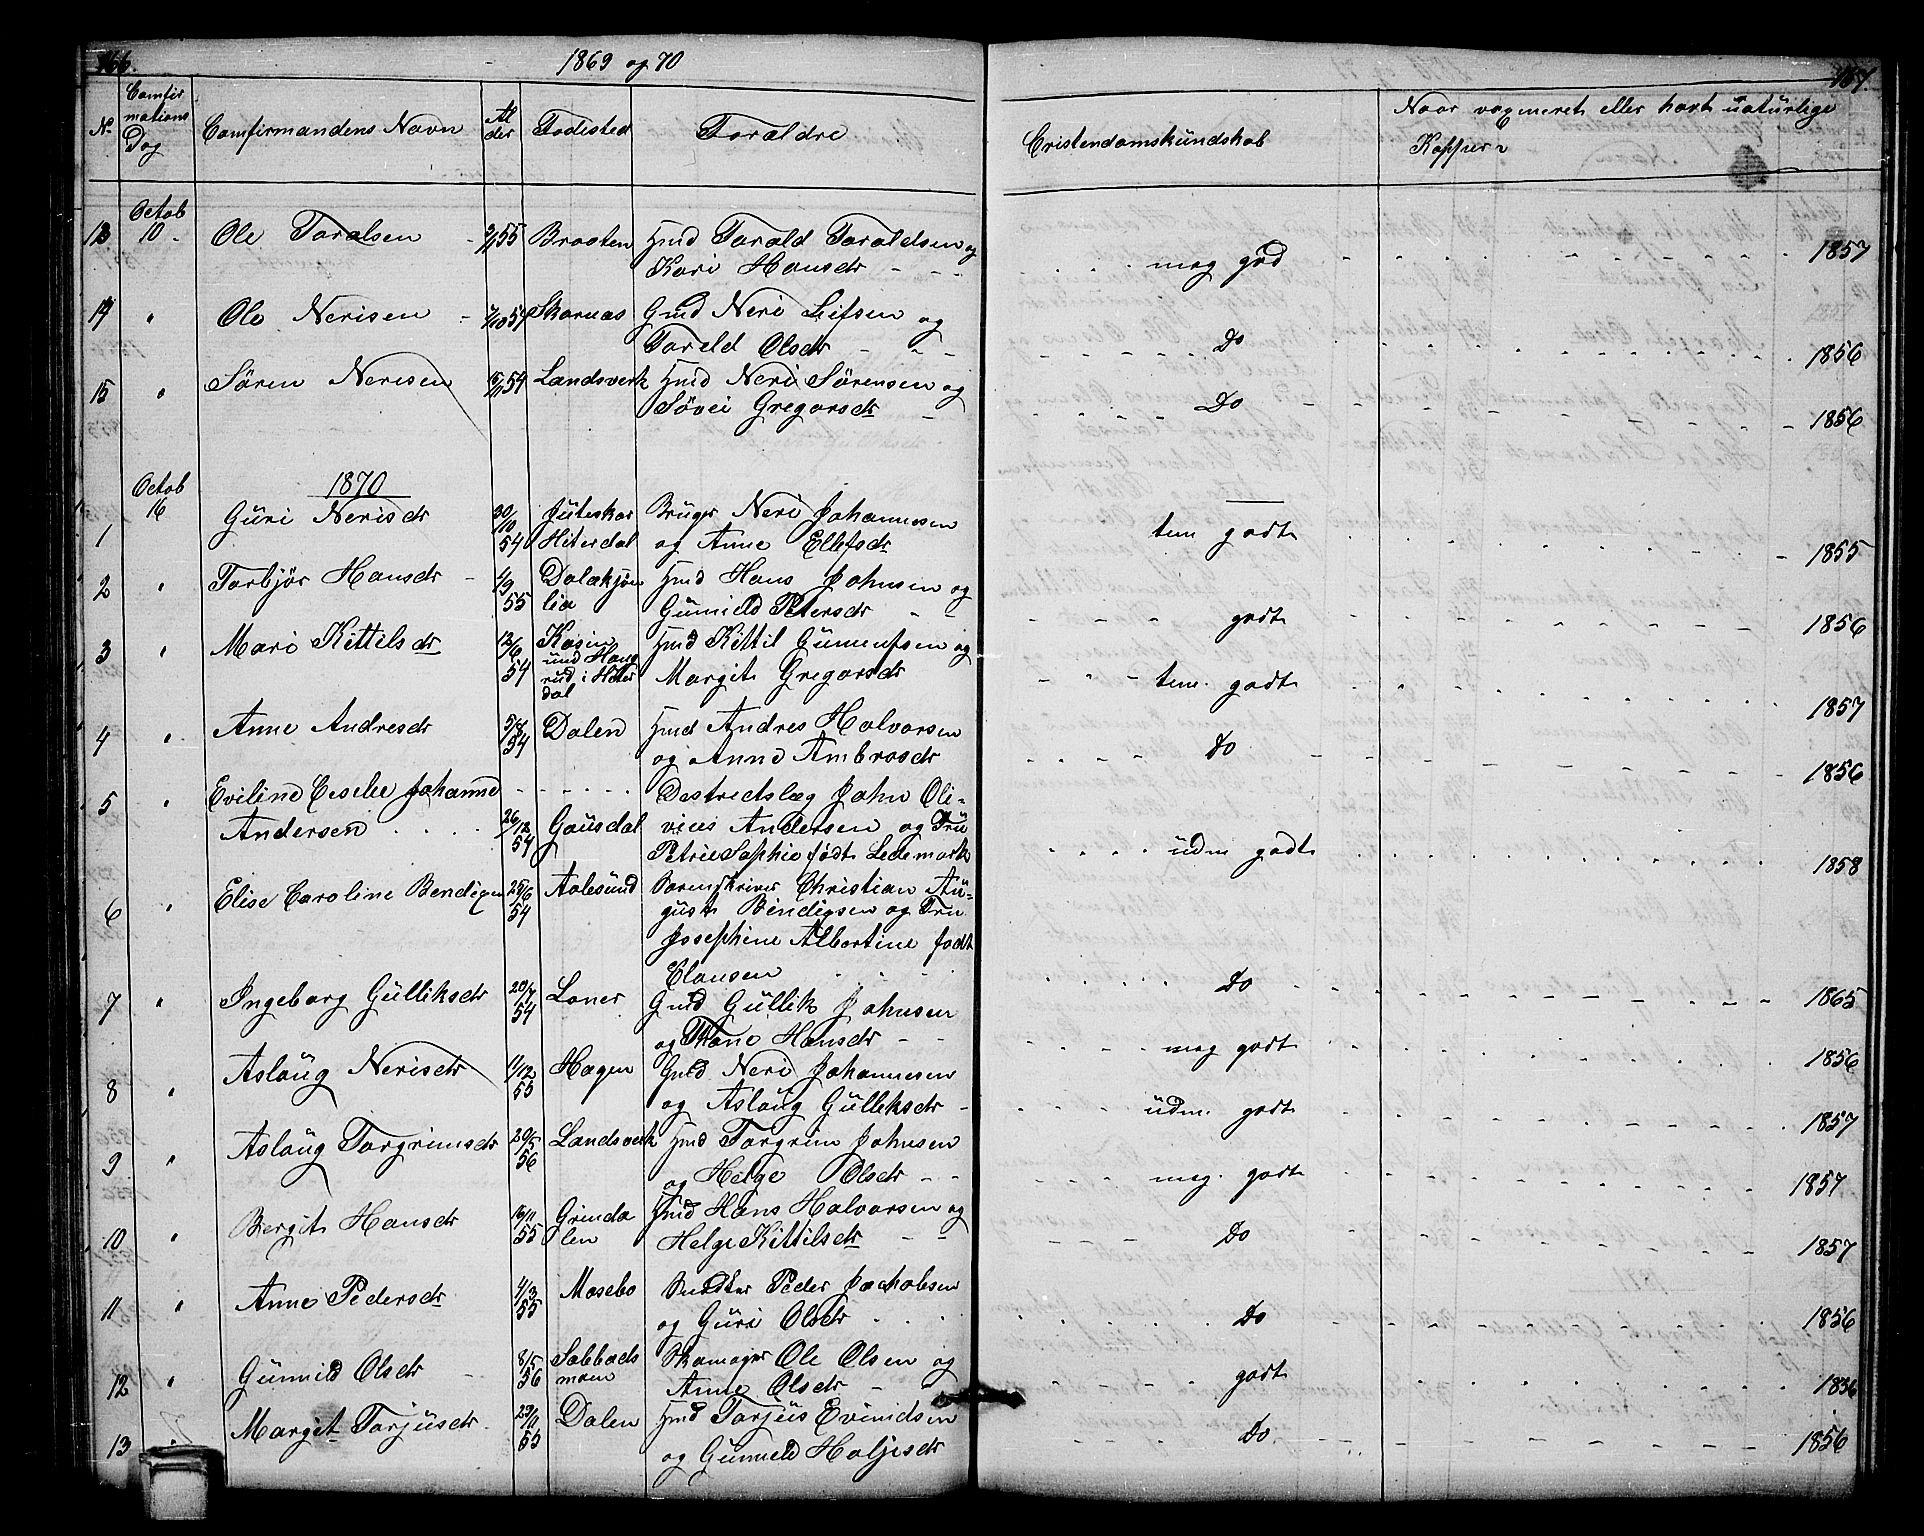 SAKO, Hjartdal kirkebøker, G/Gb/L0002: Klokkerbok nr. II 2, 1854-1884, s. 166-167